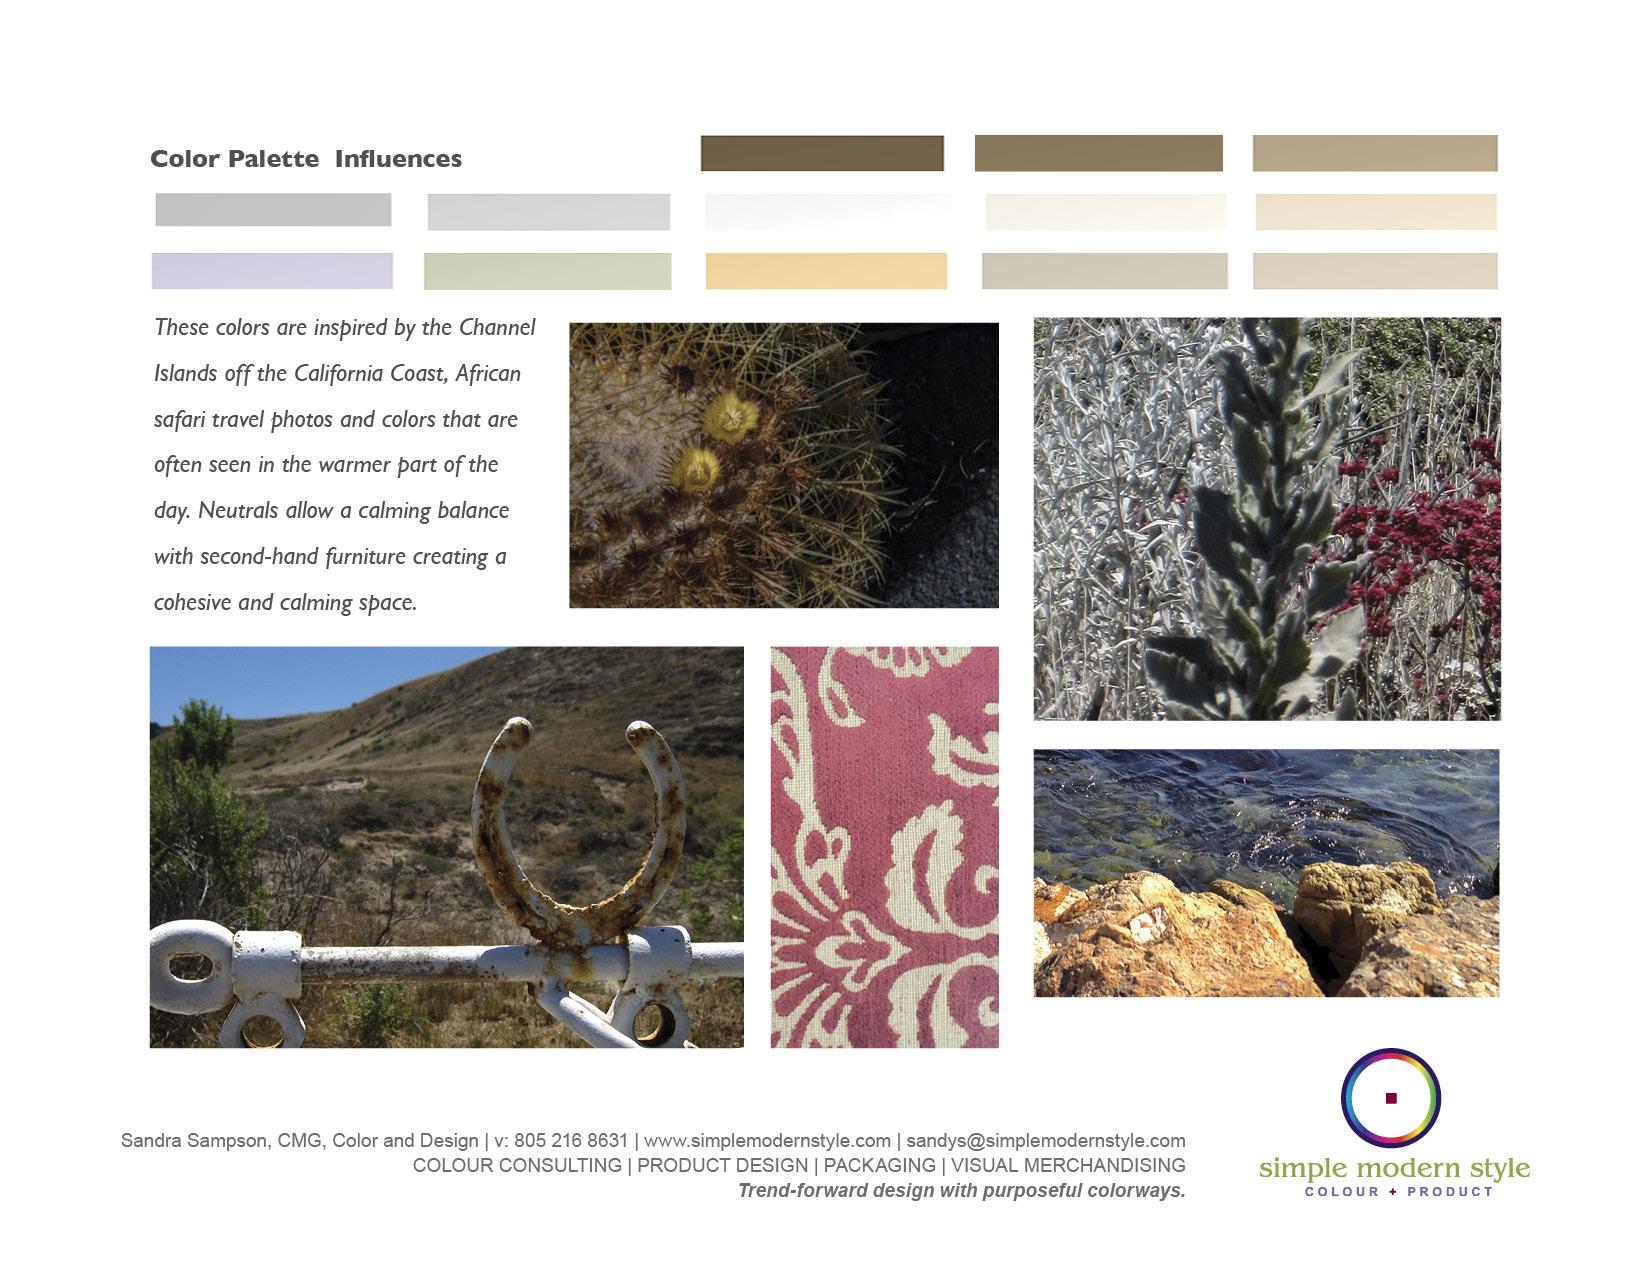 SMS_Interior_Home_Colors_Case_Study3.jpg